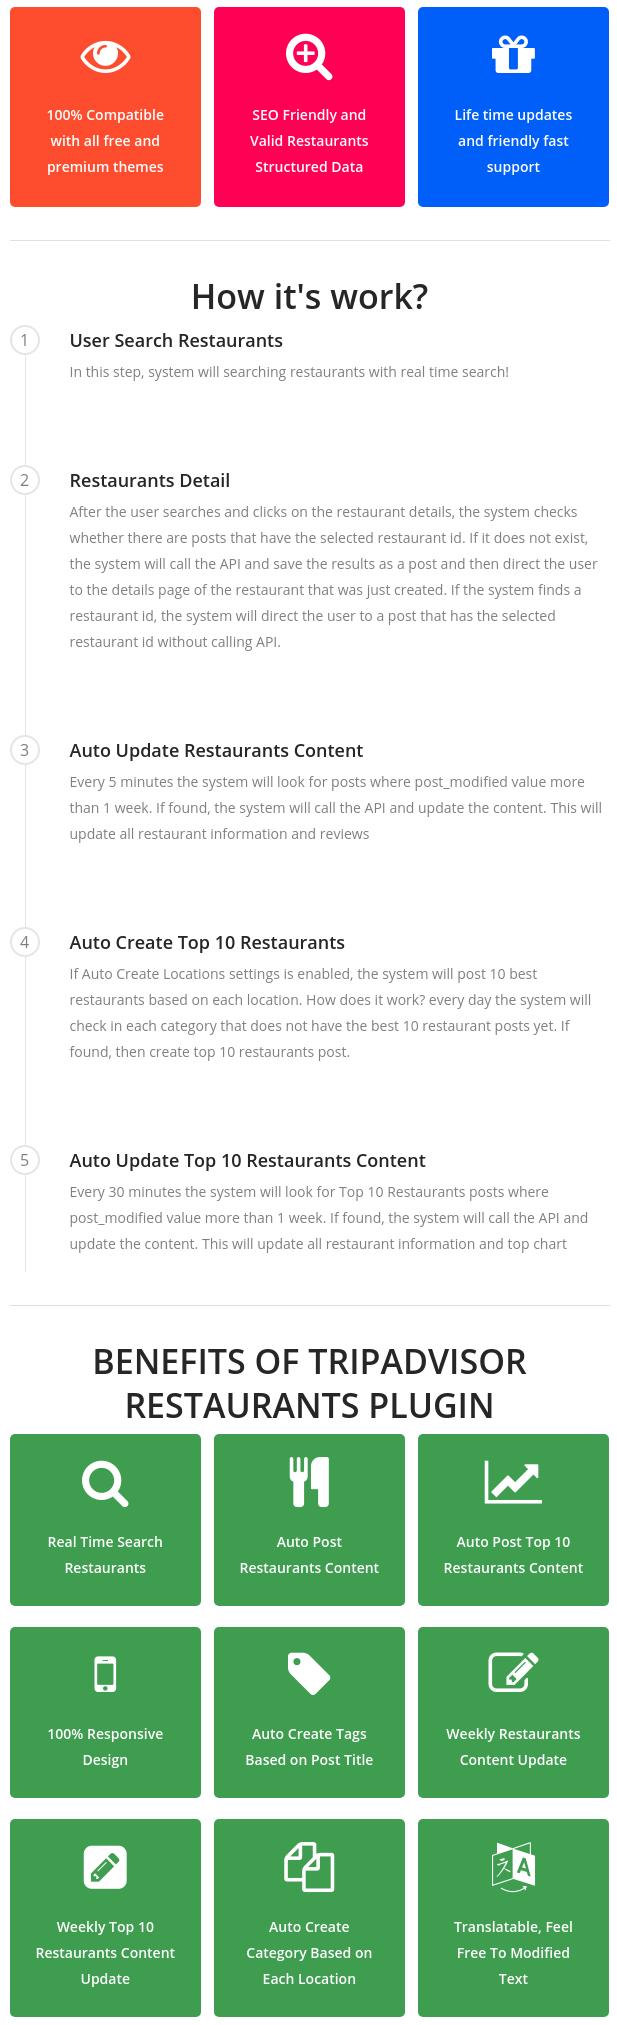 Tripadvisor Restaurants Plugin - 1